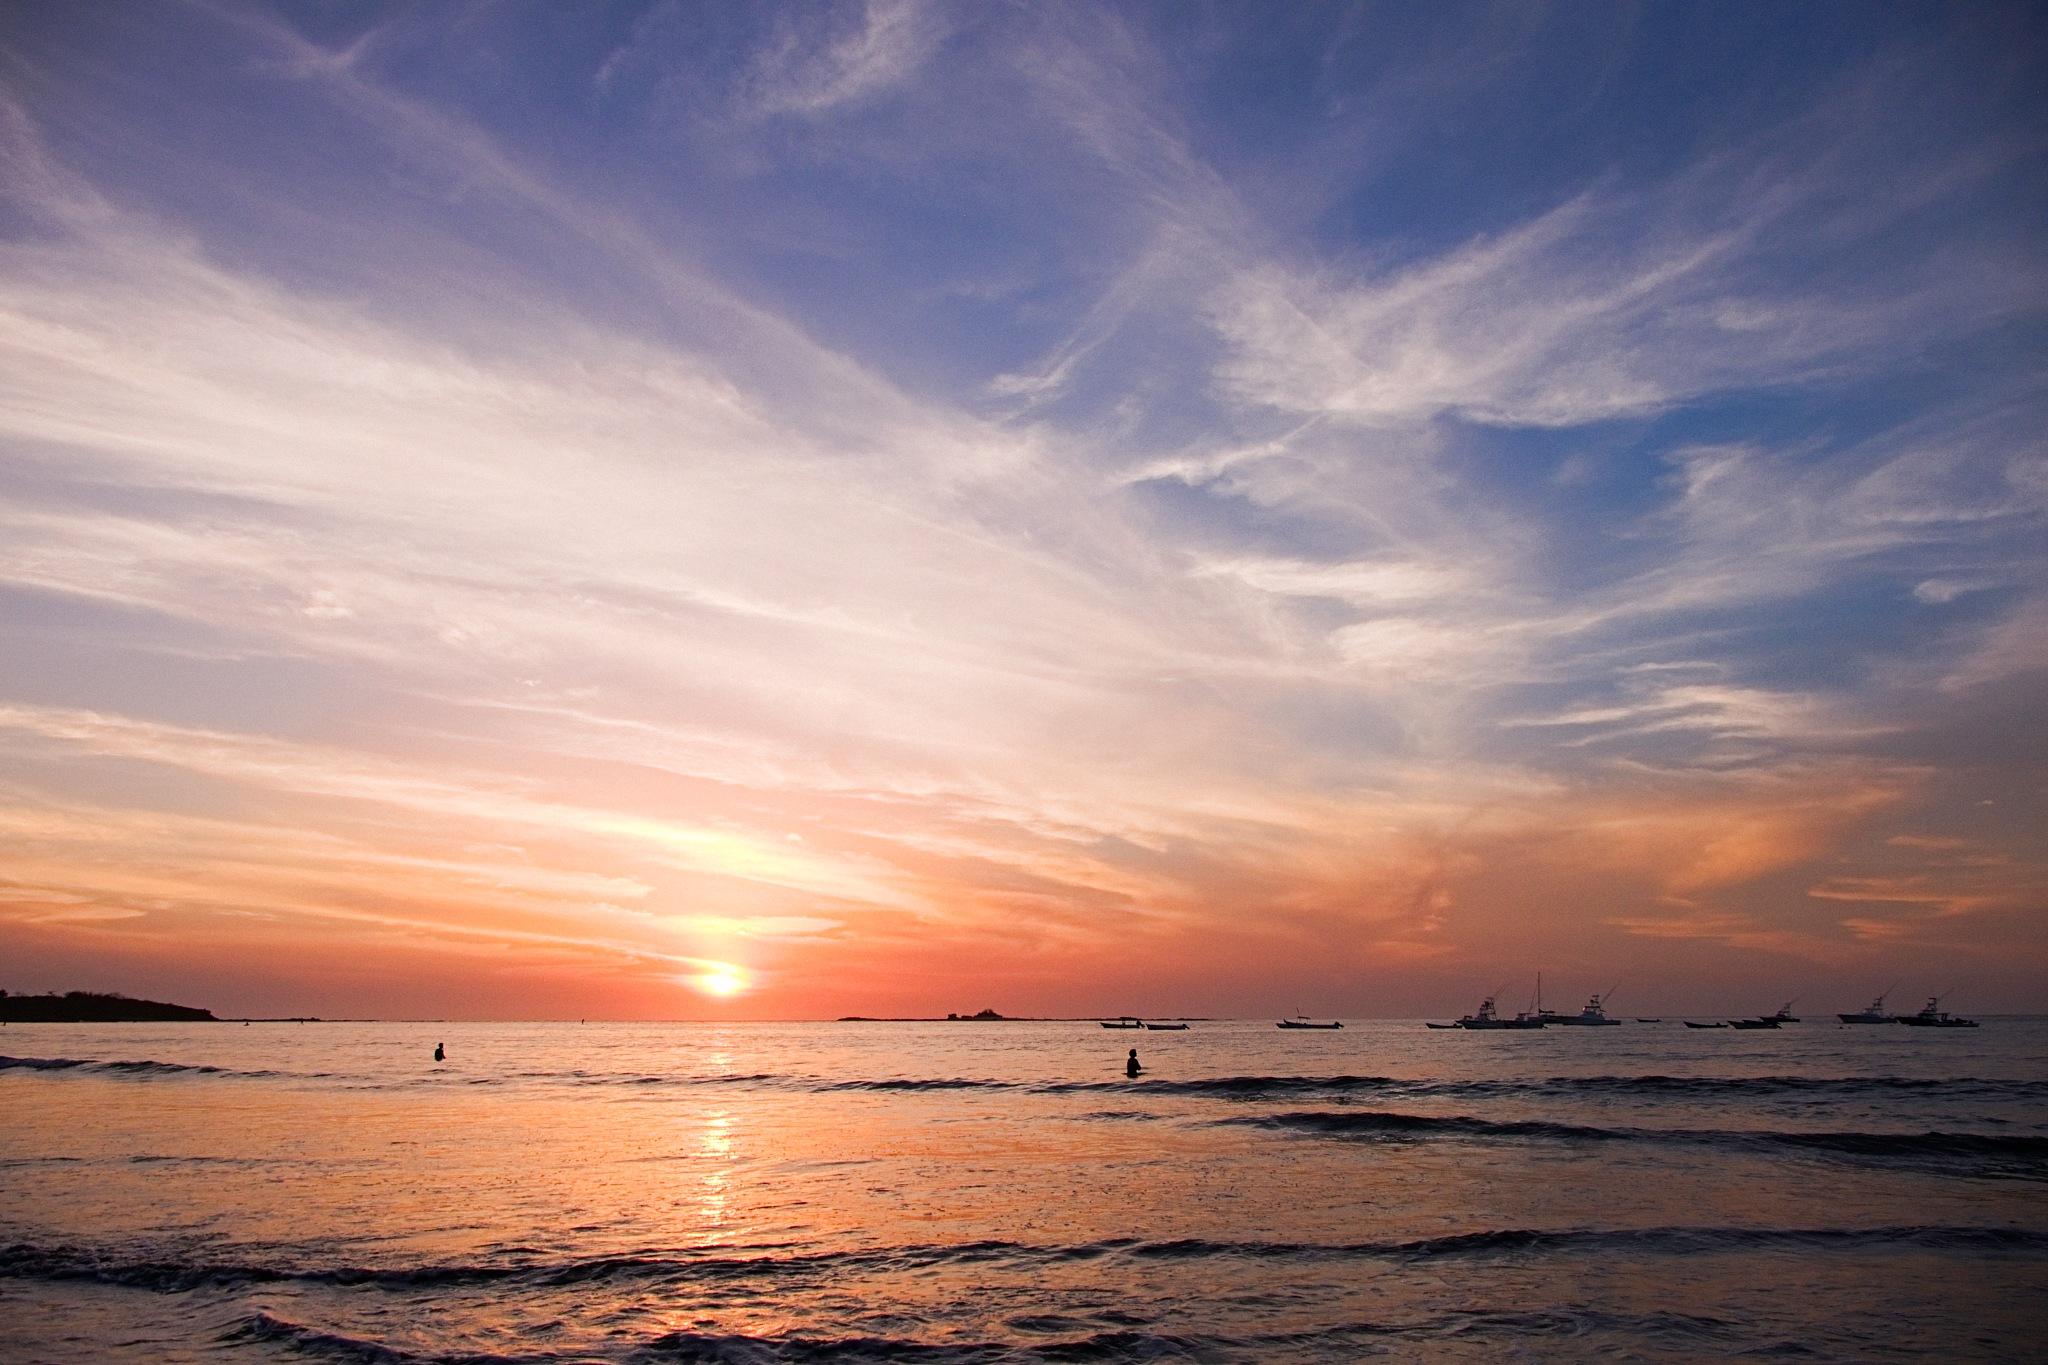 Sunset no. 1 Tamarindo Bay by Smilin' Dog